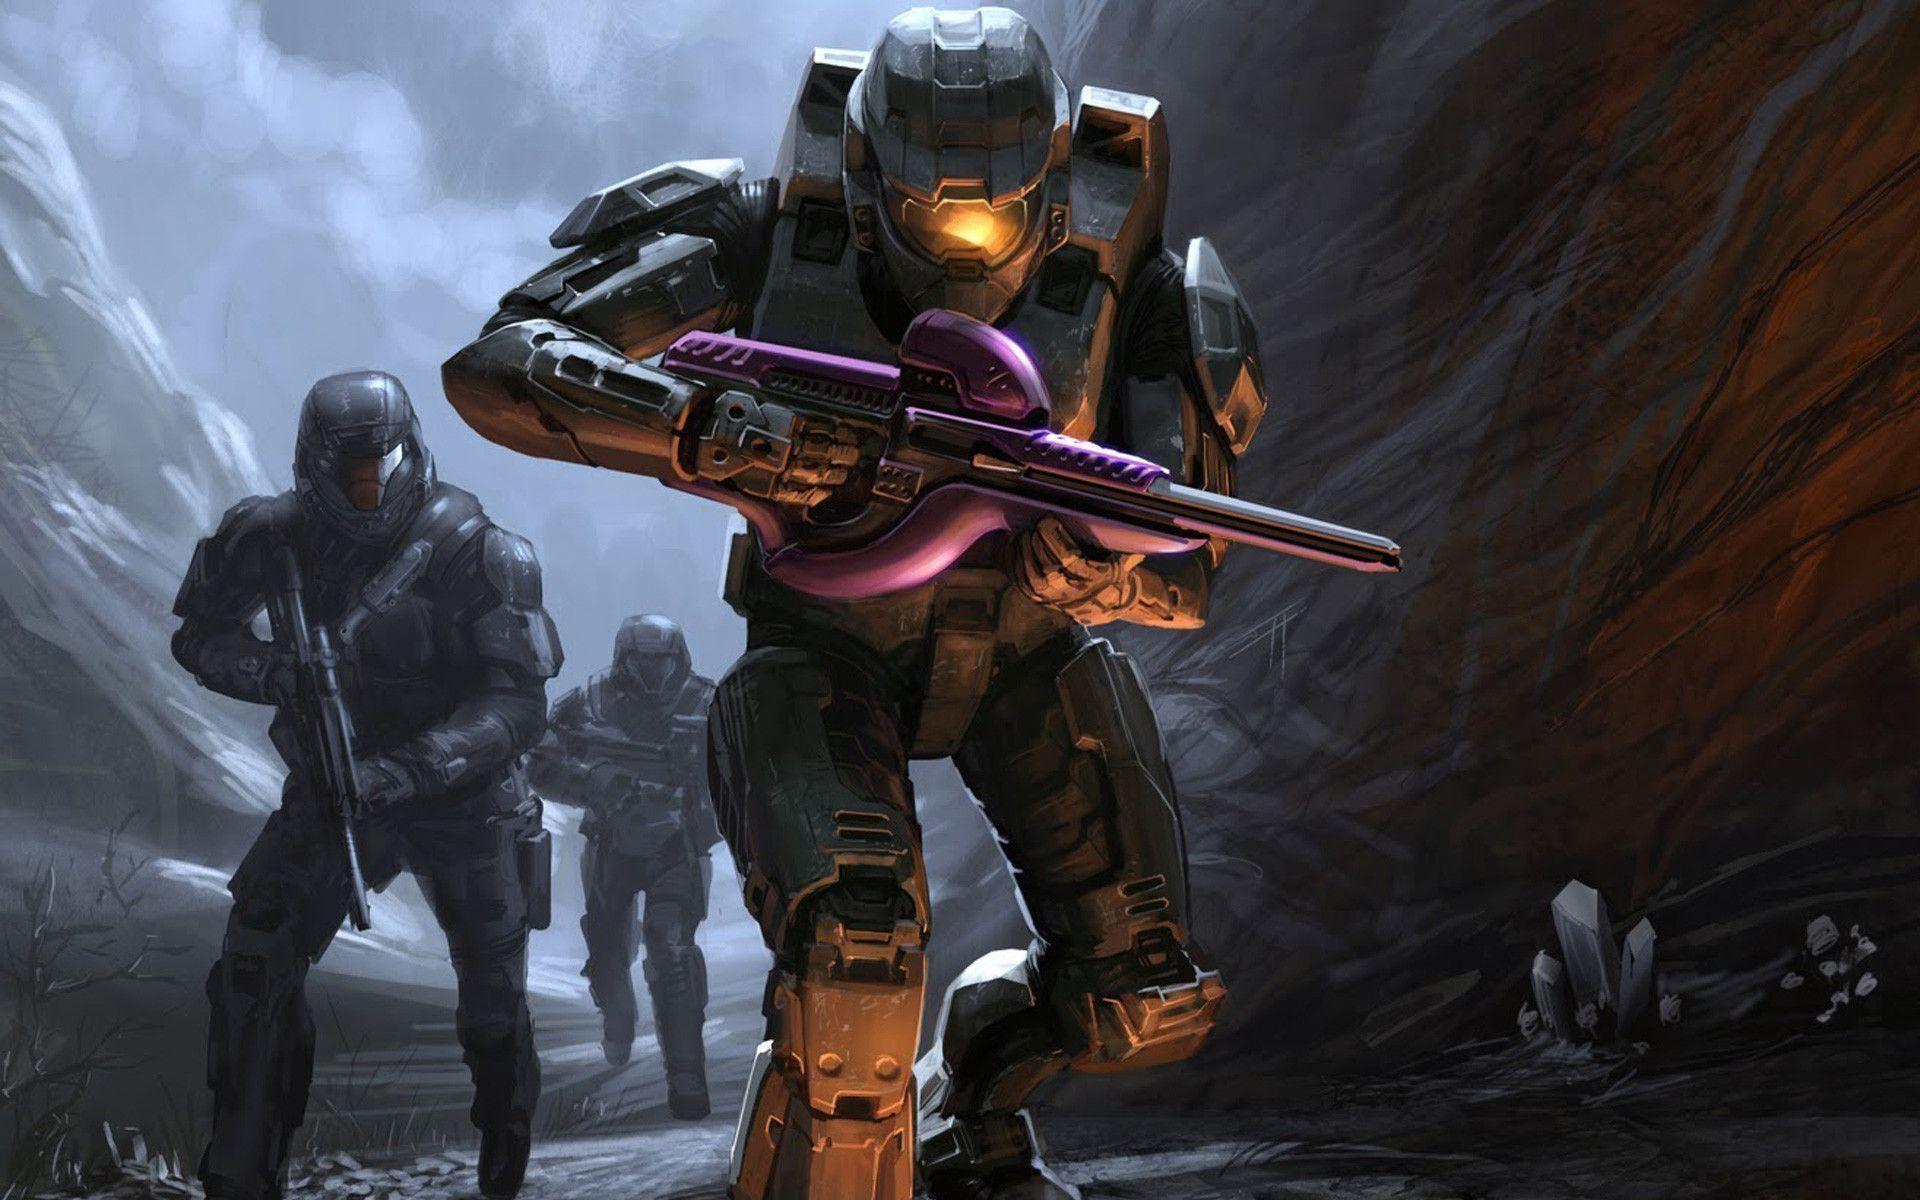 Halo 3 Arbiter Wallpaper (86+ images)